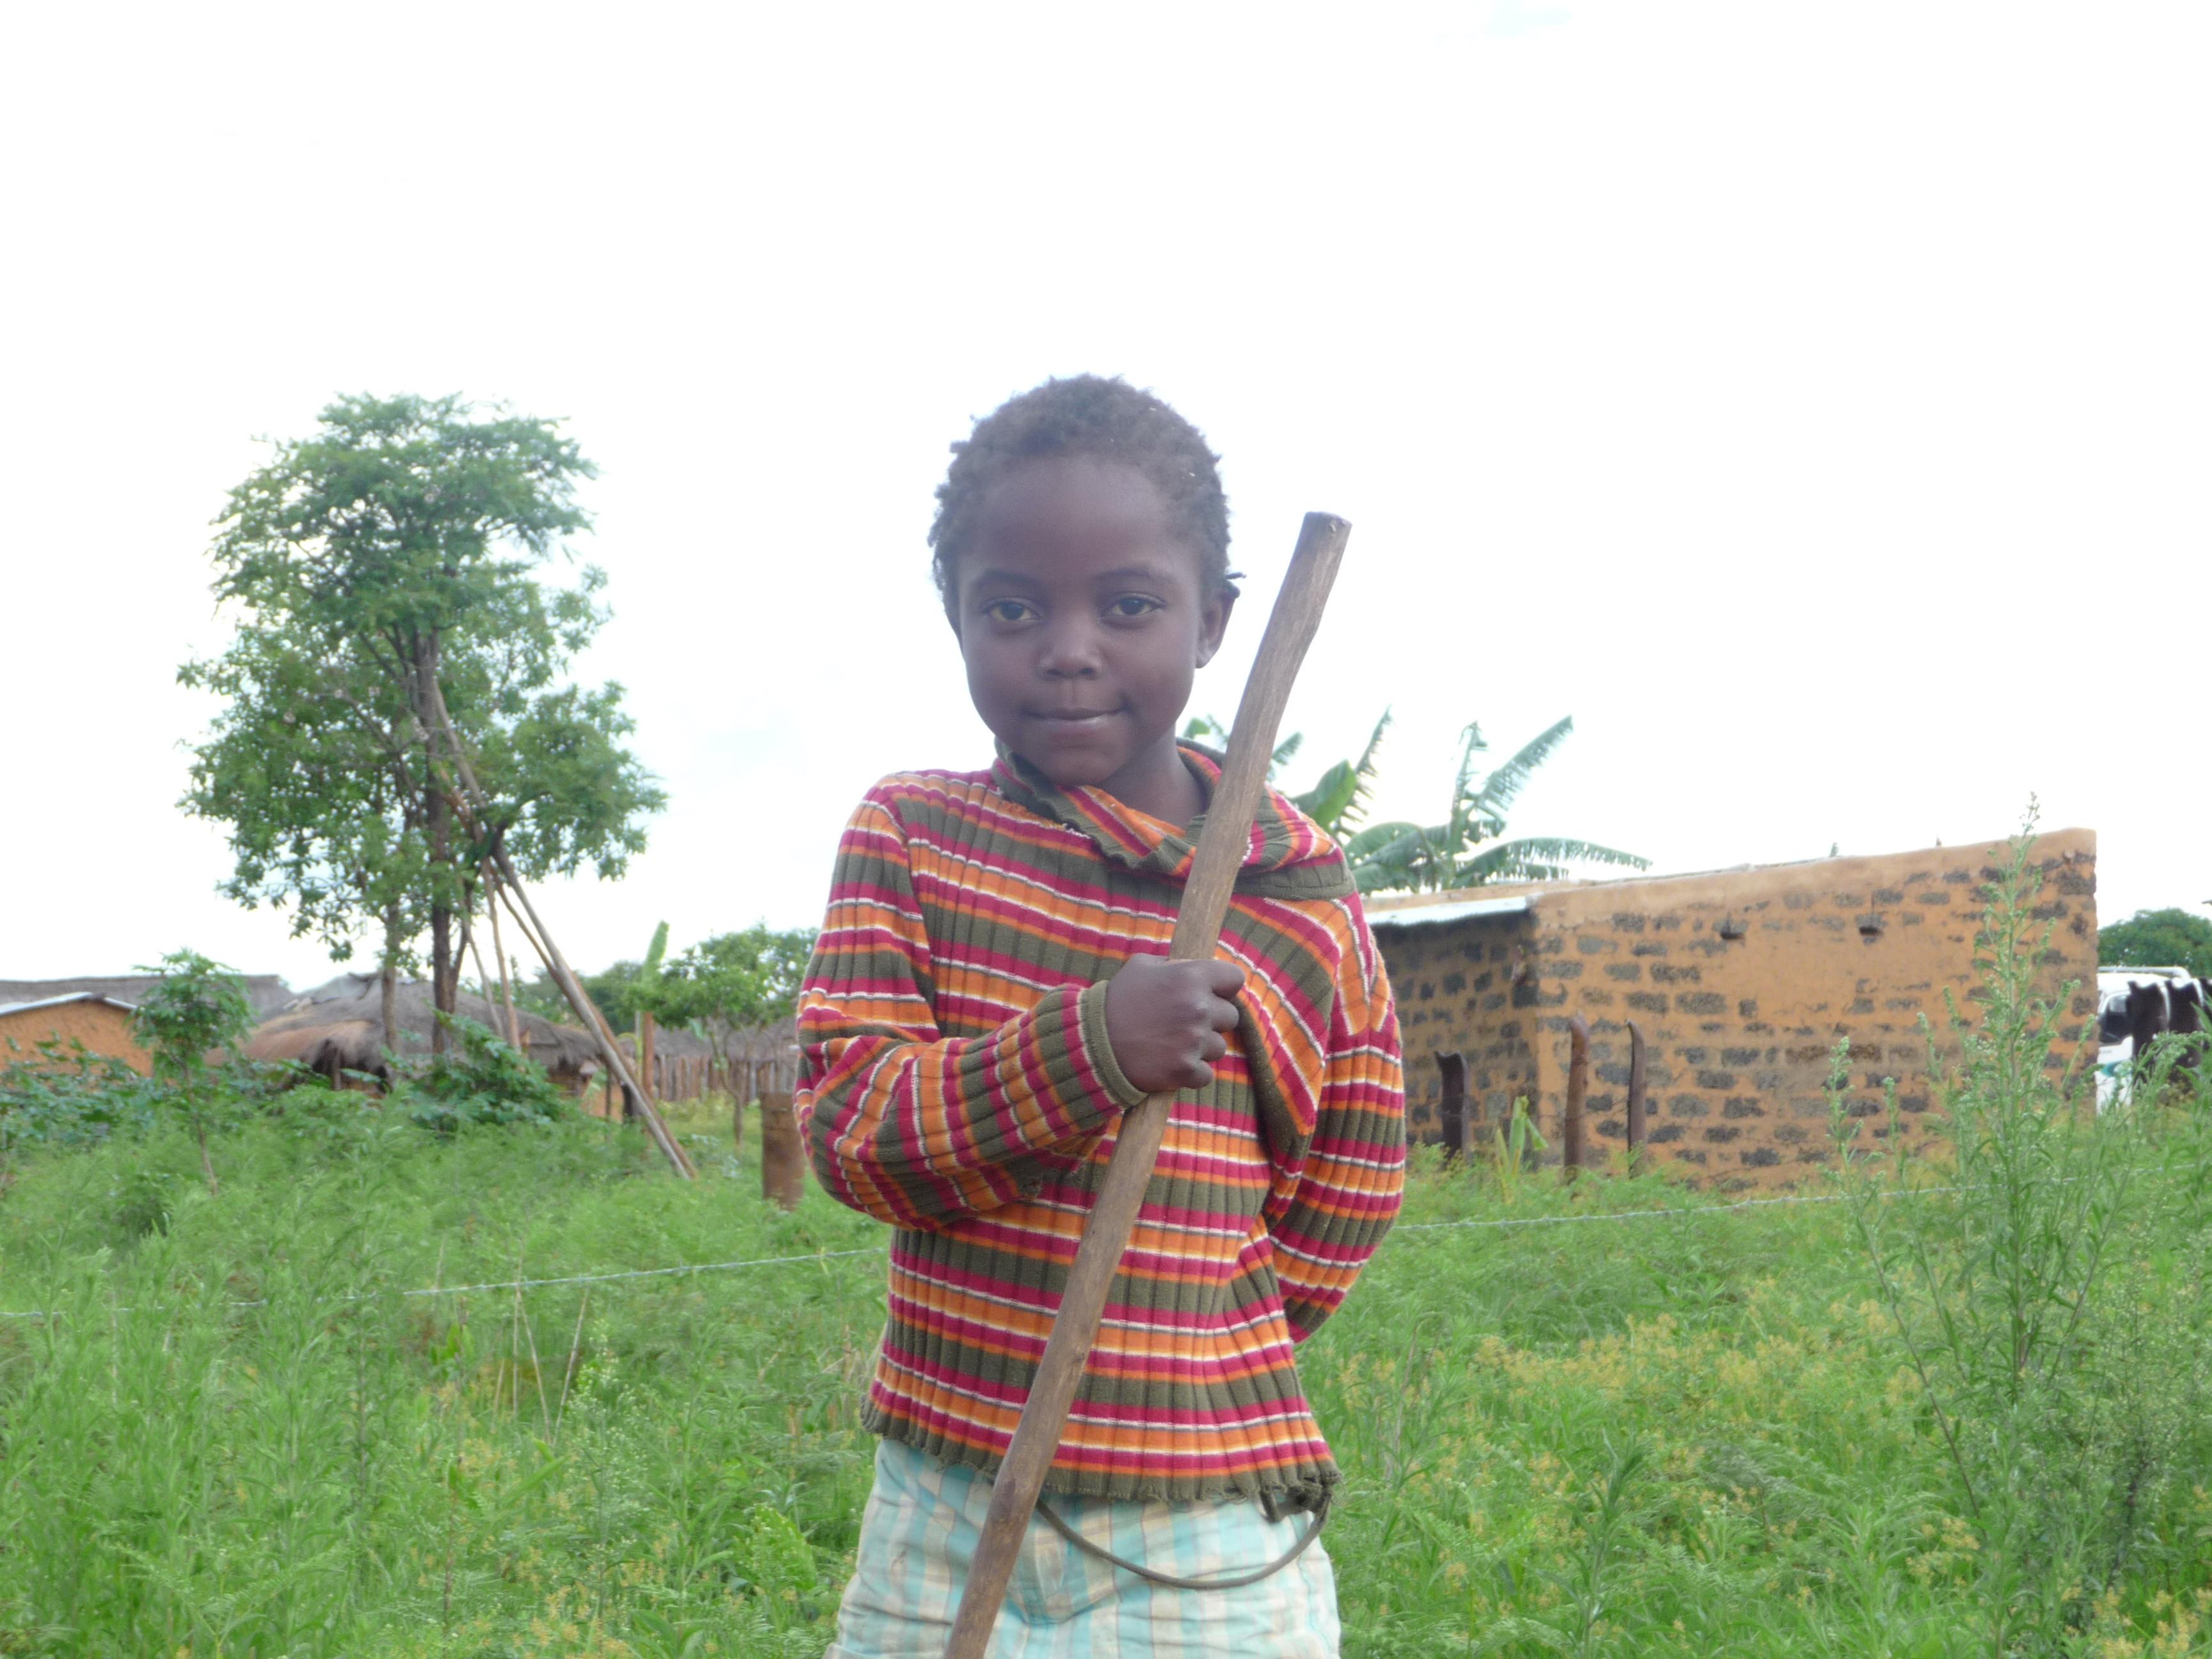 bambino Angola